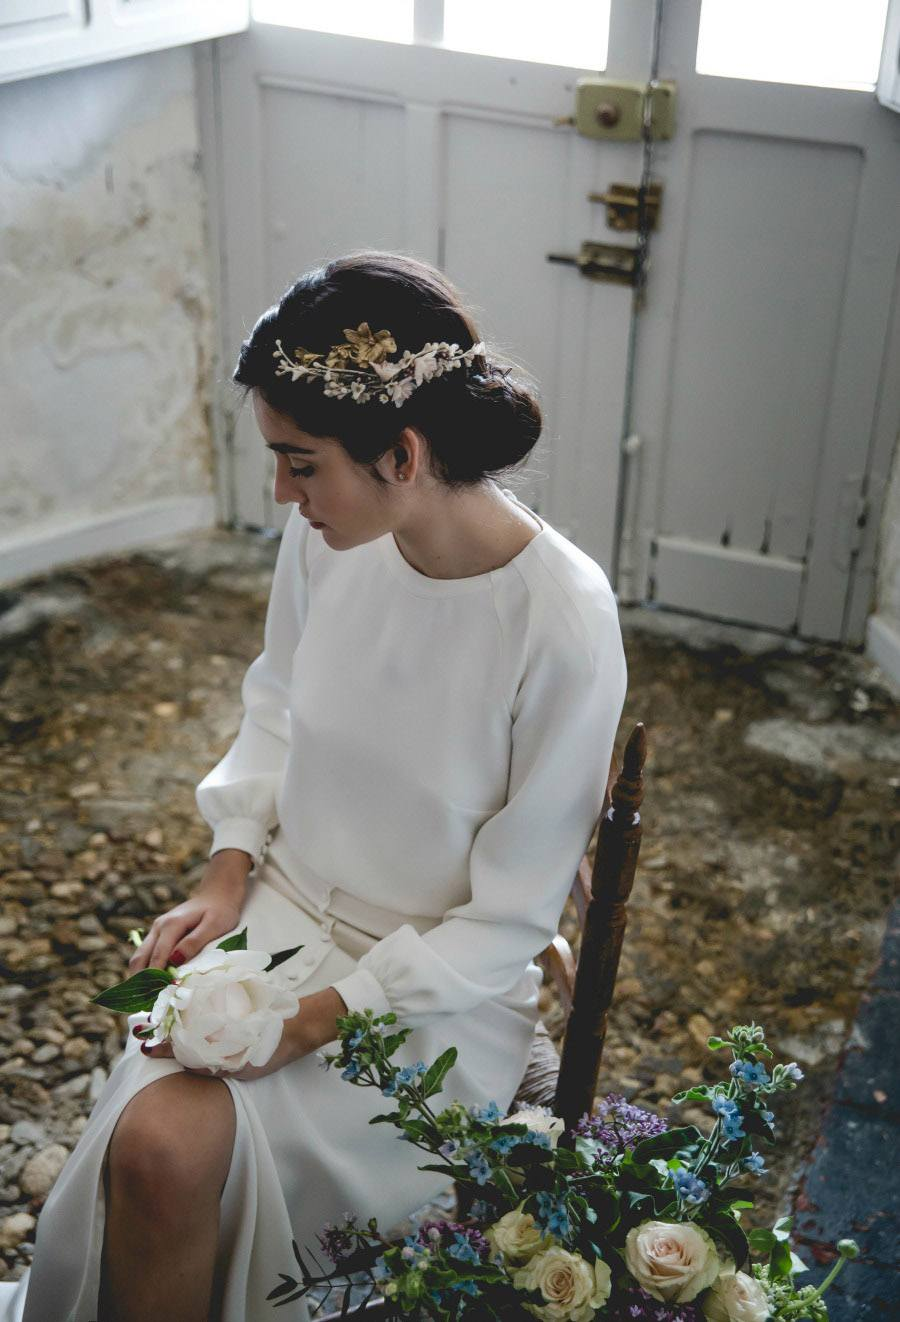 LAS NOVIAS DE ALEJANDRA SVARC coleccion-de-novia-alejandra-svarc